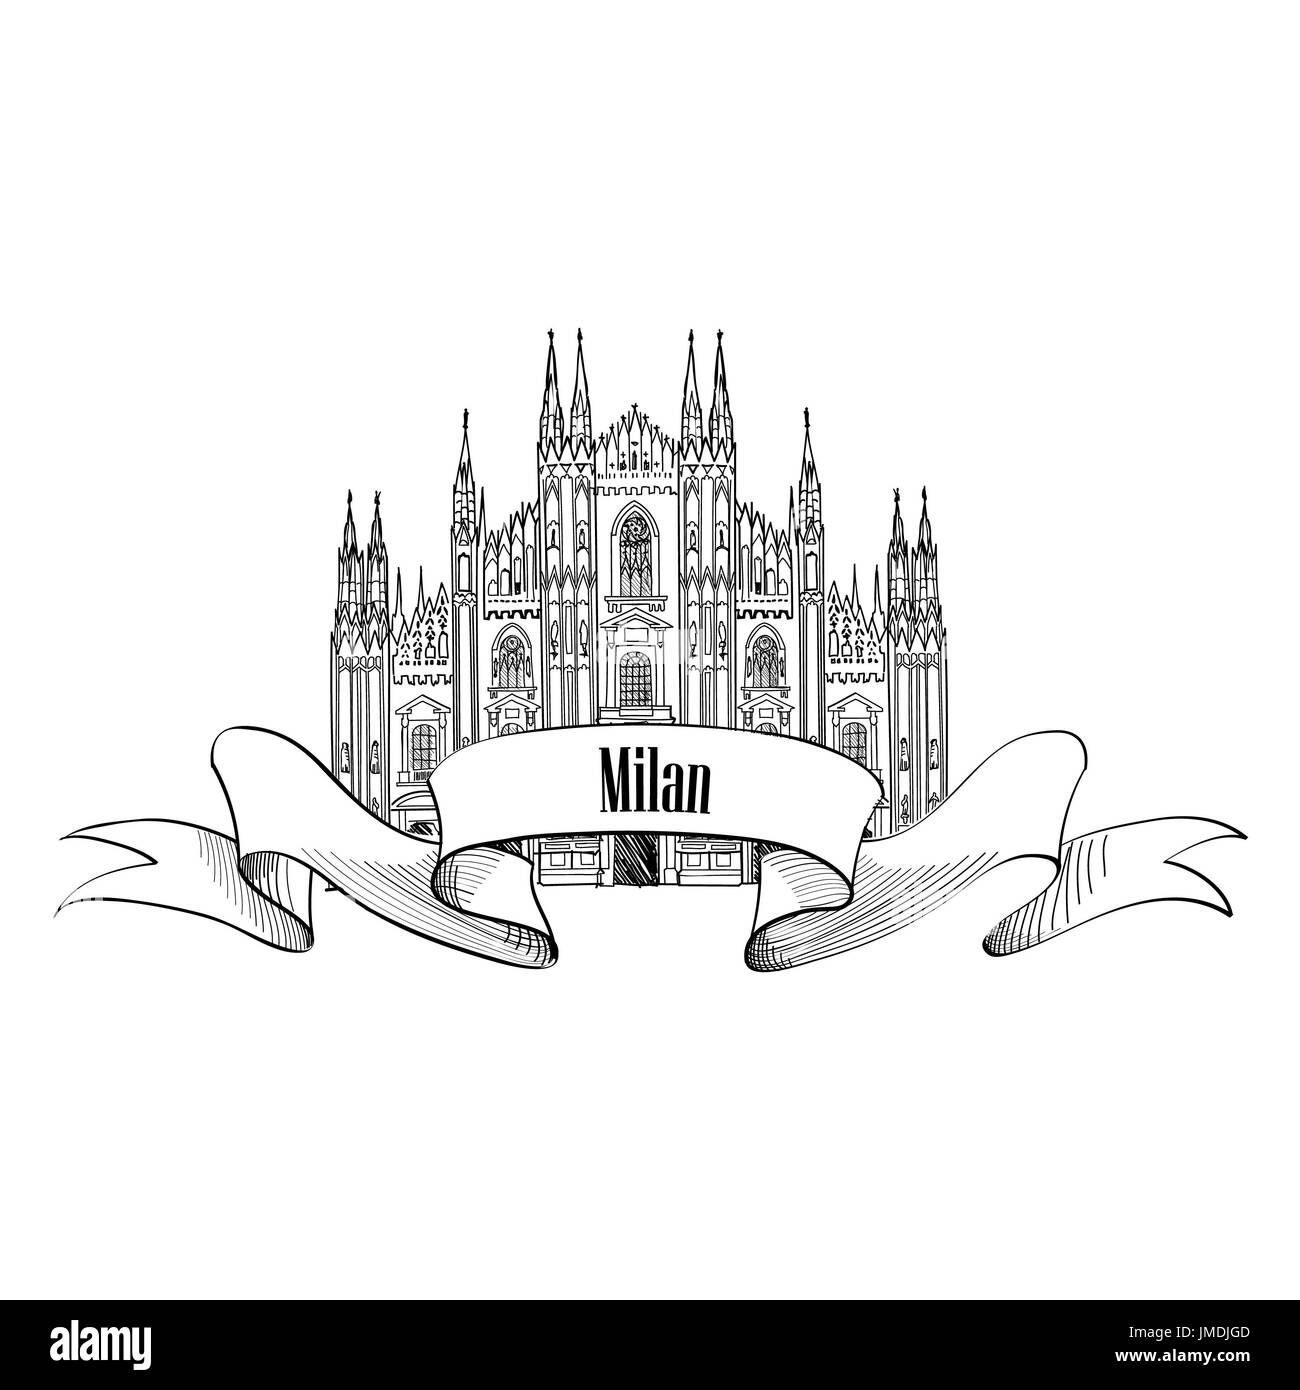 Milan symbol. Travel Italy icon. Hand drawn sketch. Duomo cathedral in Milan - Stock Image